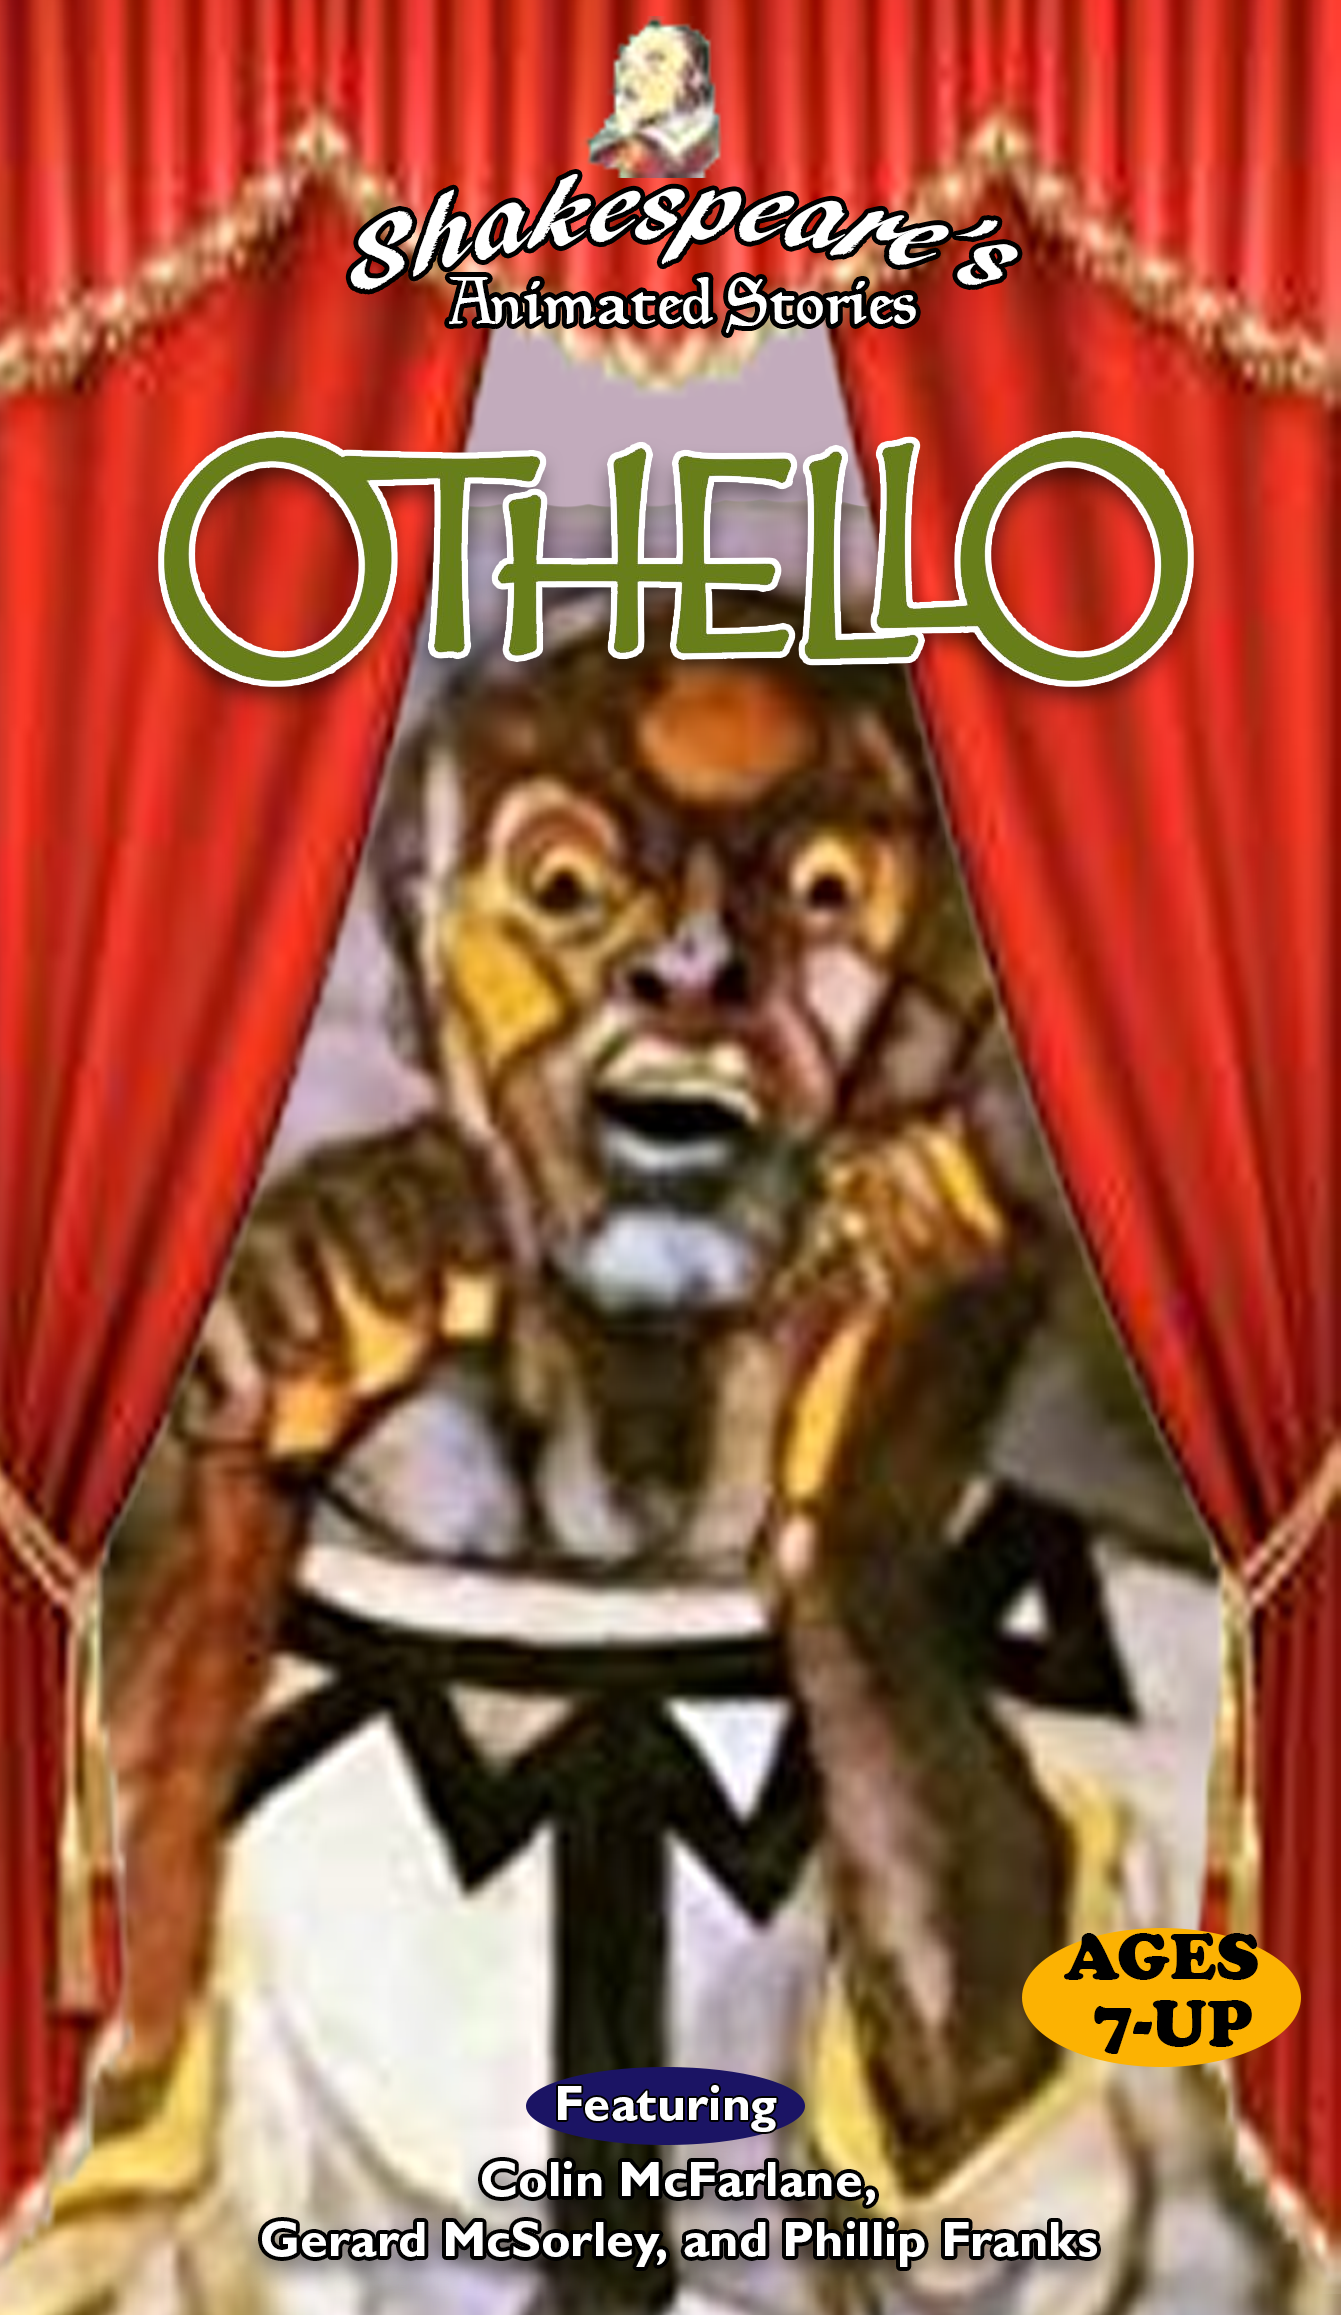 Shakespeare's Animated Stories: Othello (1998 VHS)